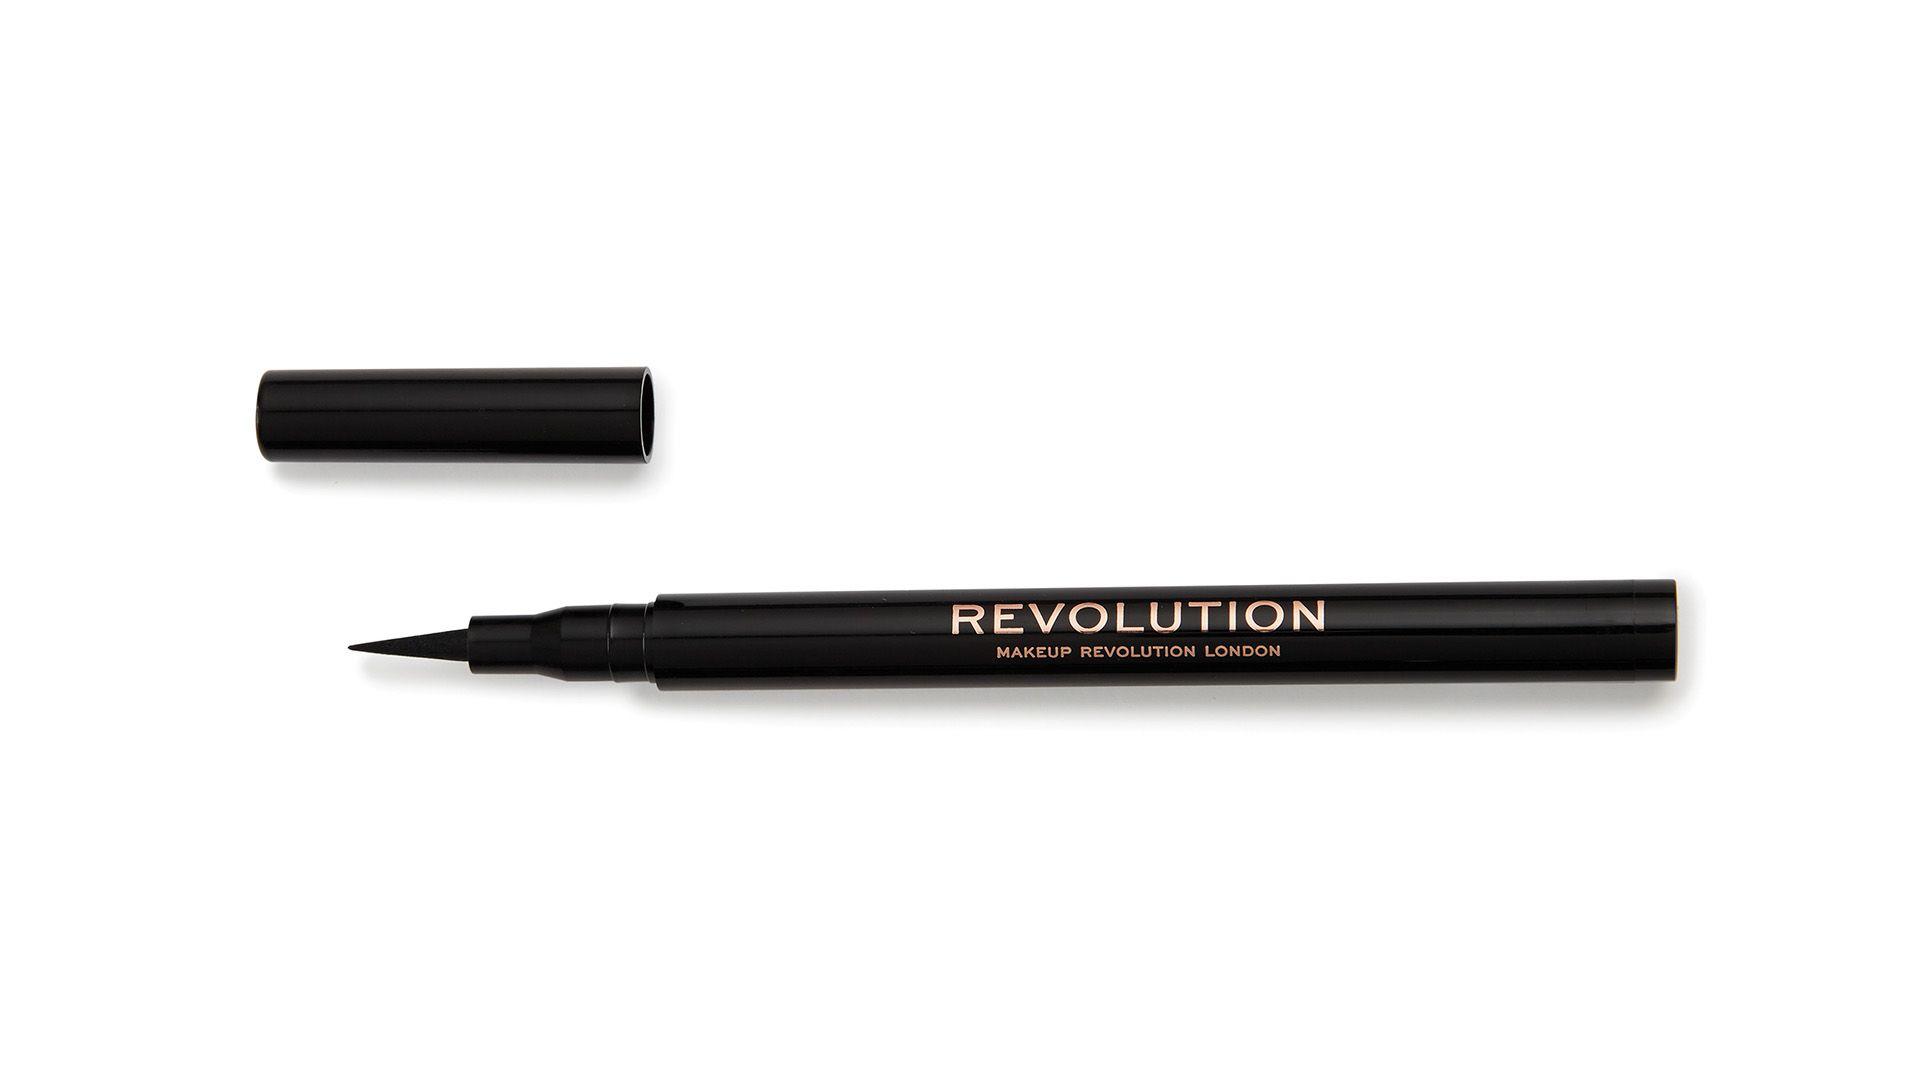 Revolution - The Liner Revolution Szemhéjtus